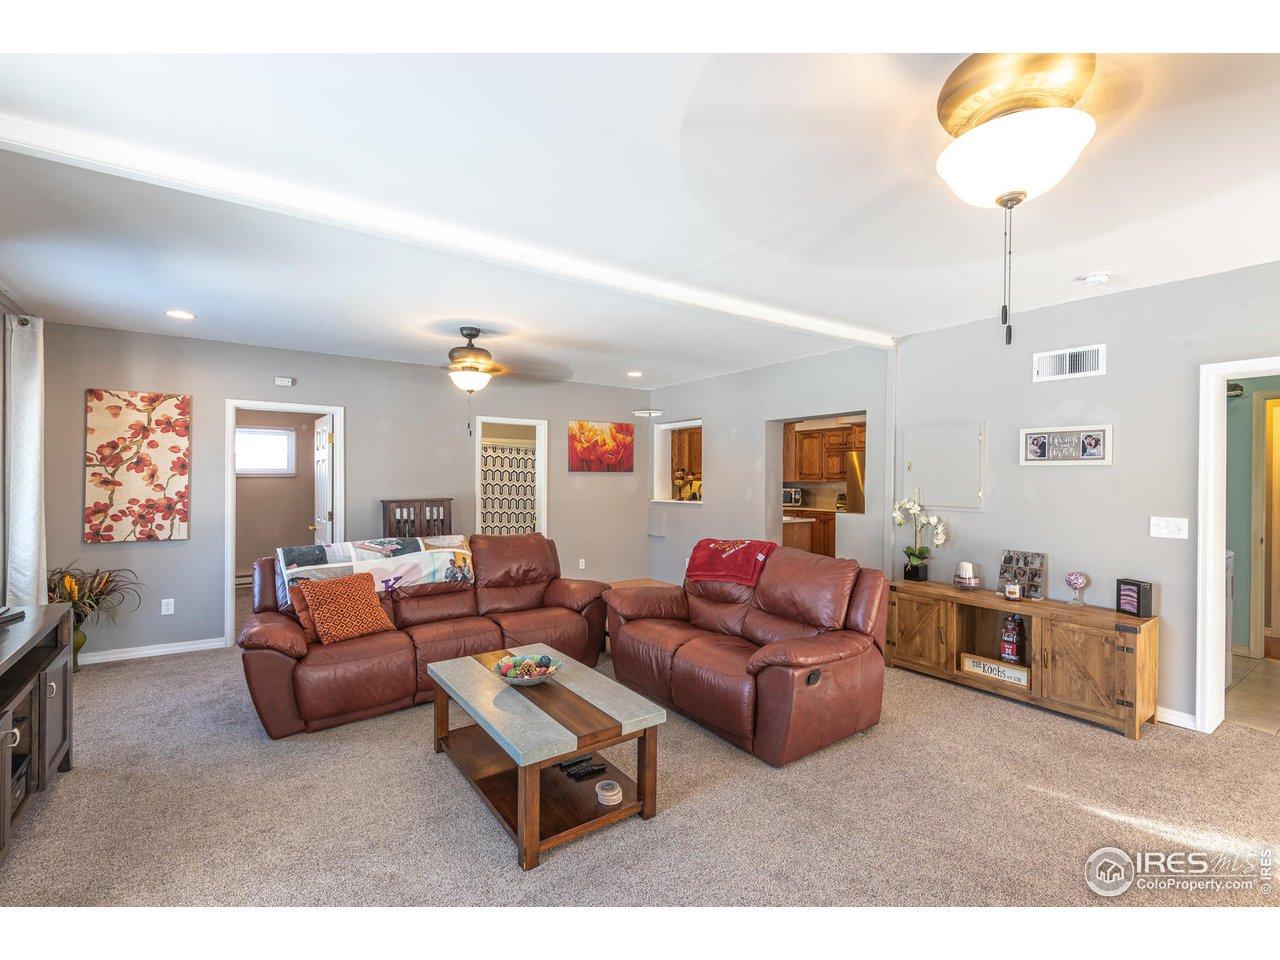 24x18 Family Room